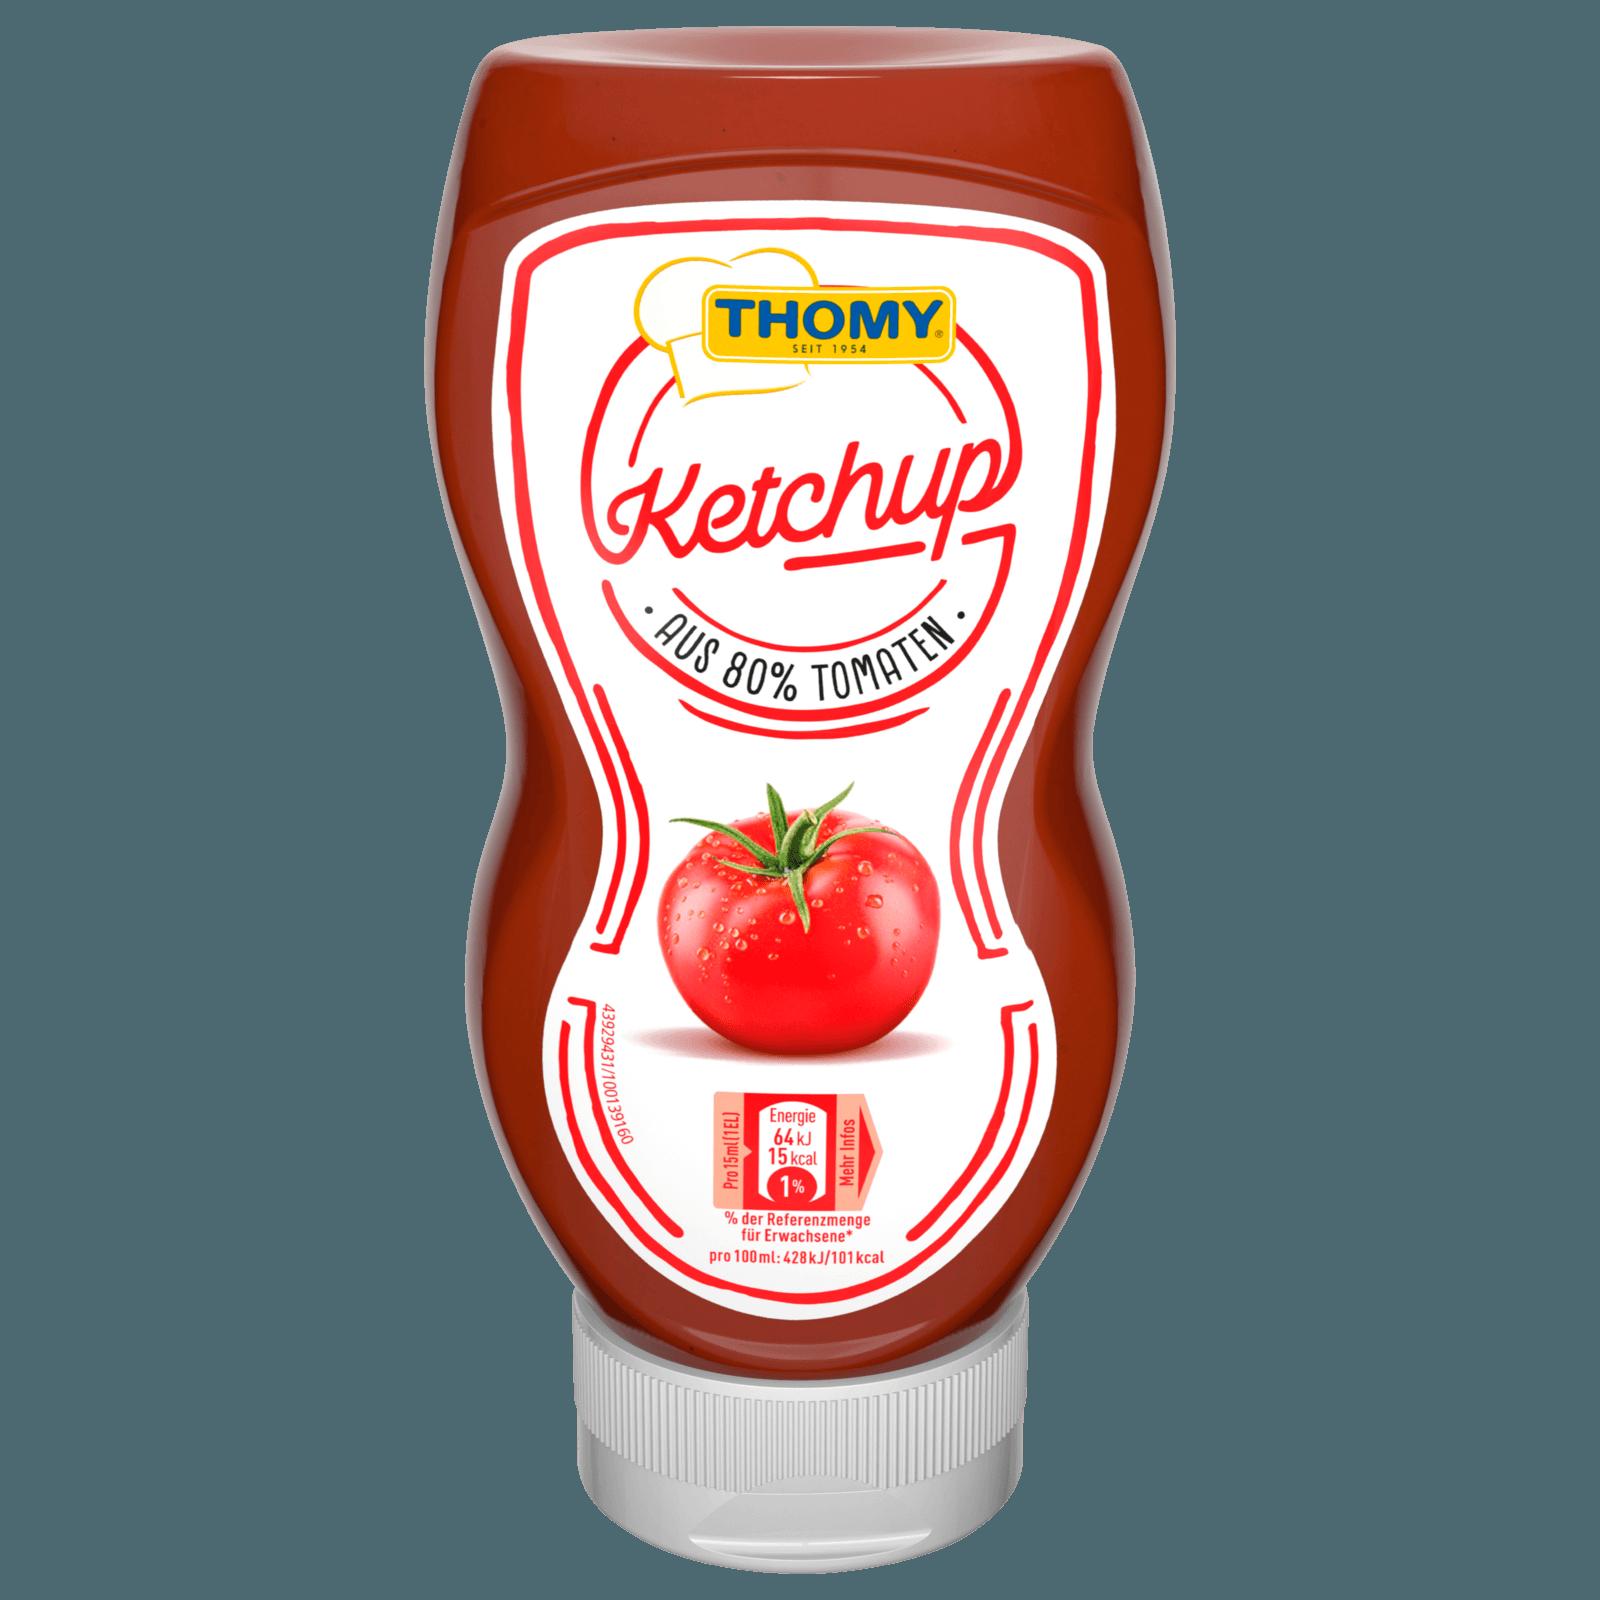 Thomy Ketchup 80 % Tomate 230ml